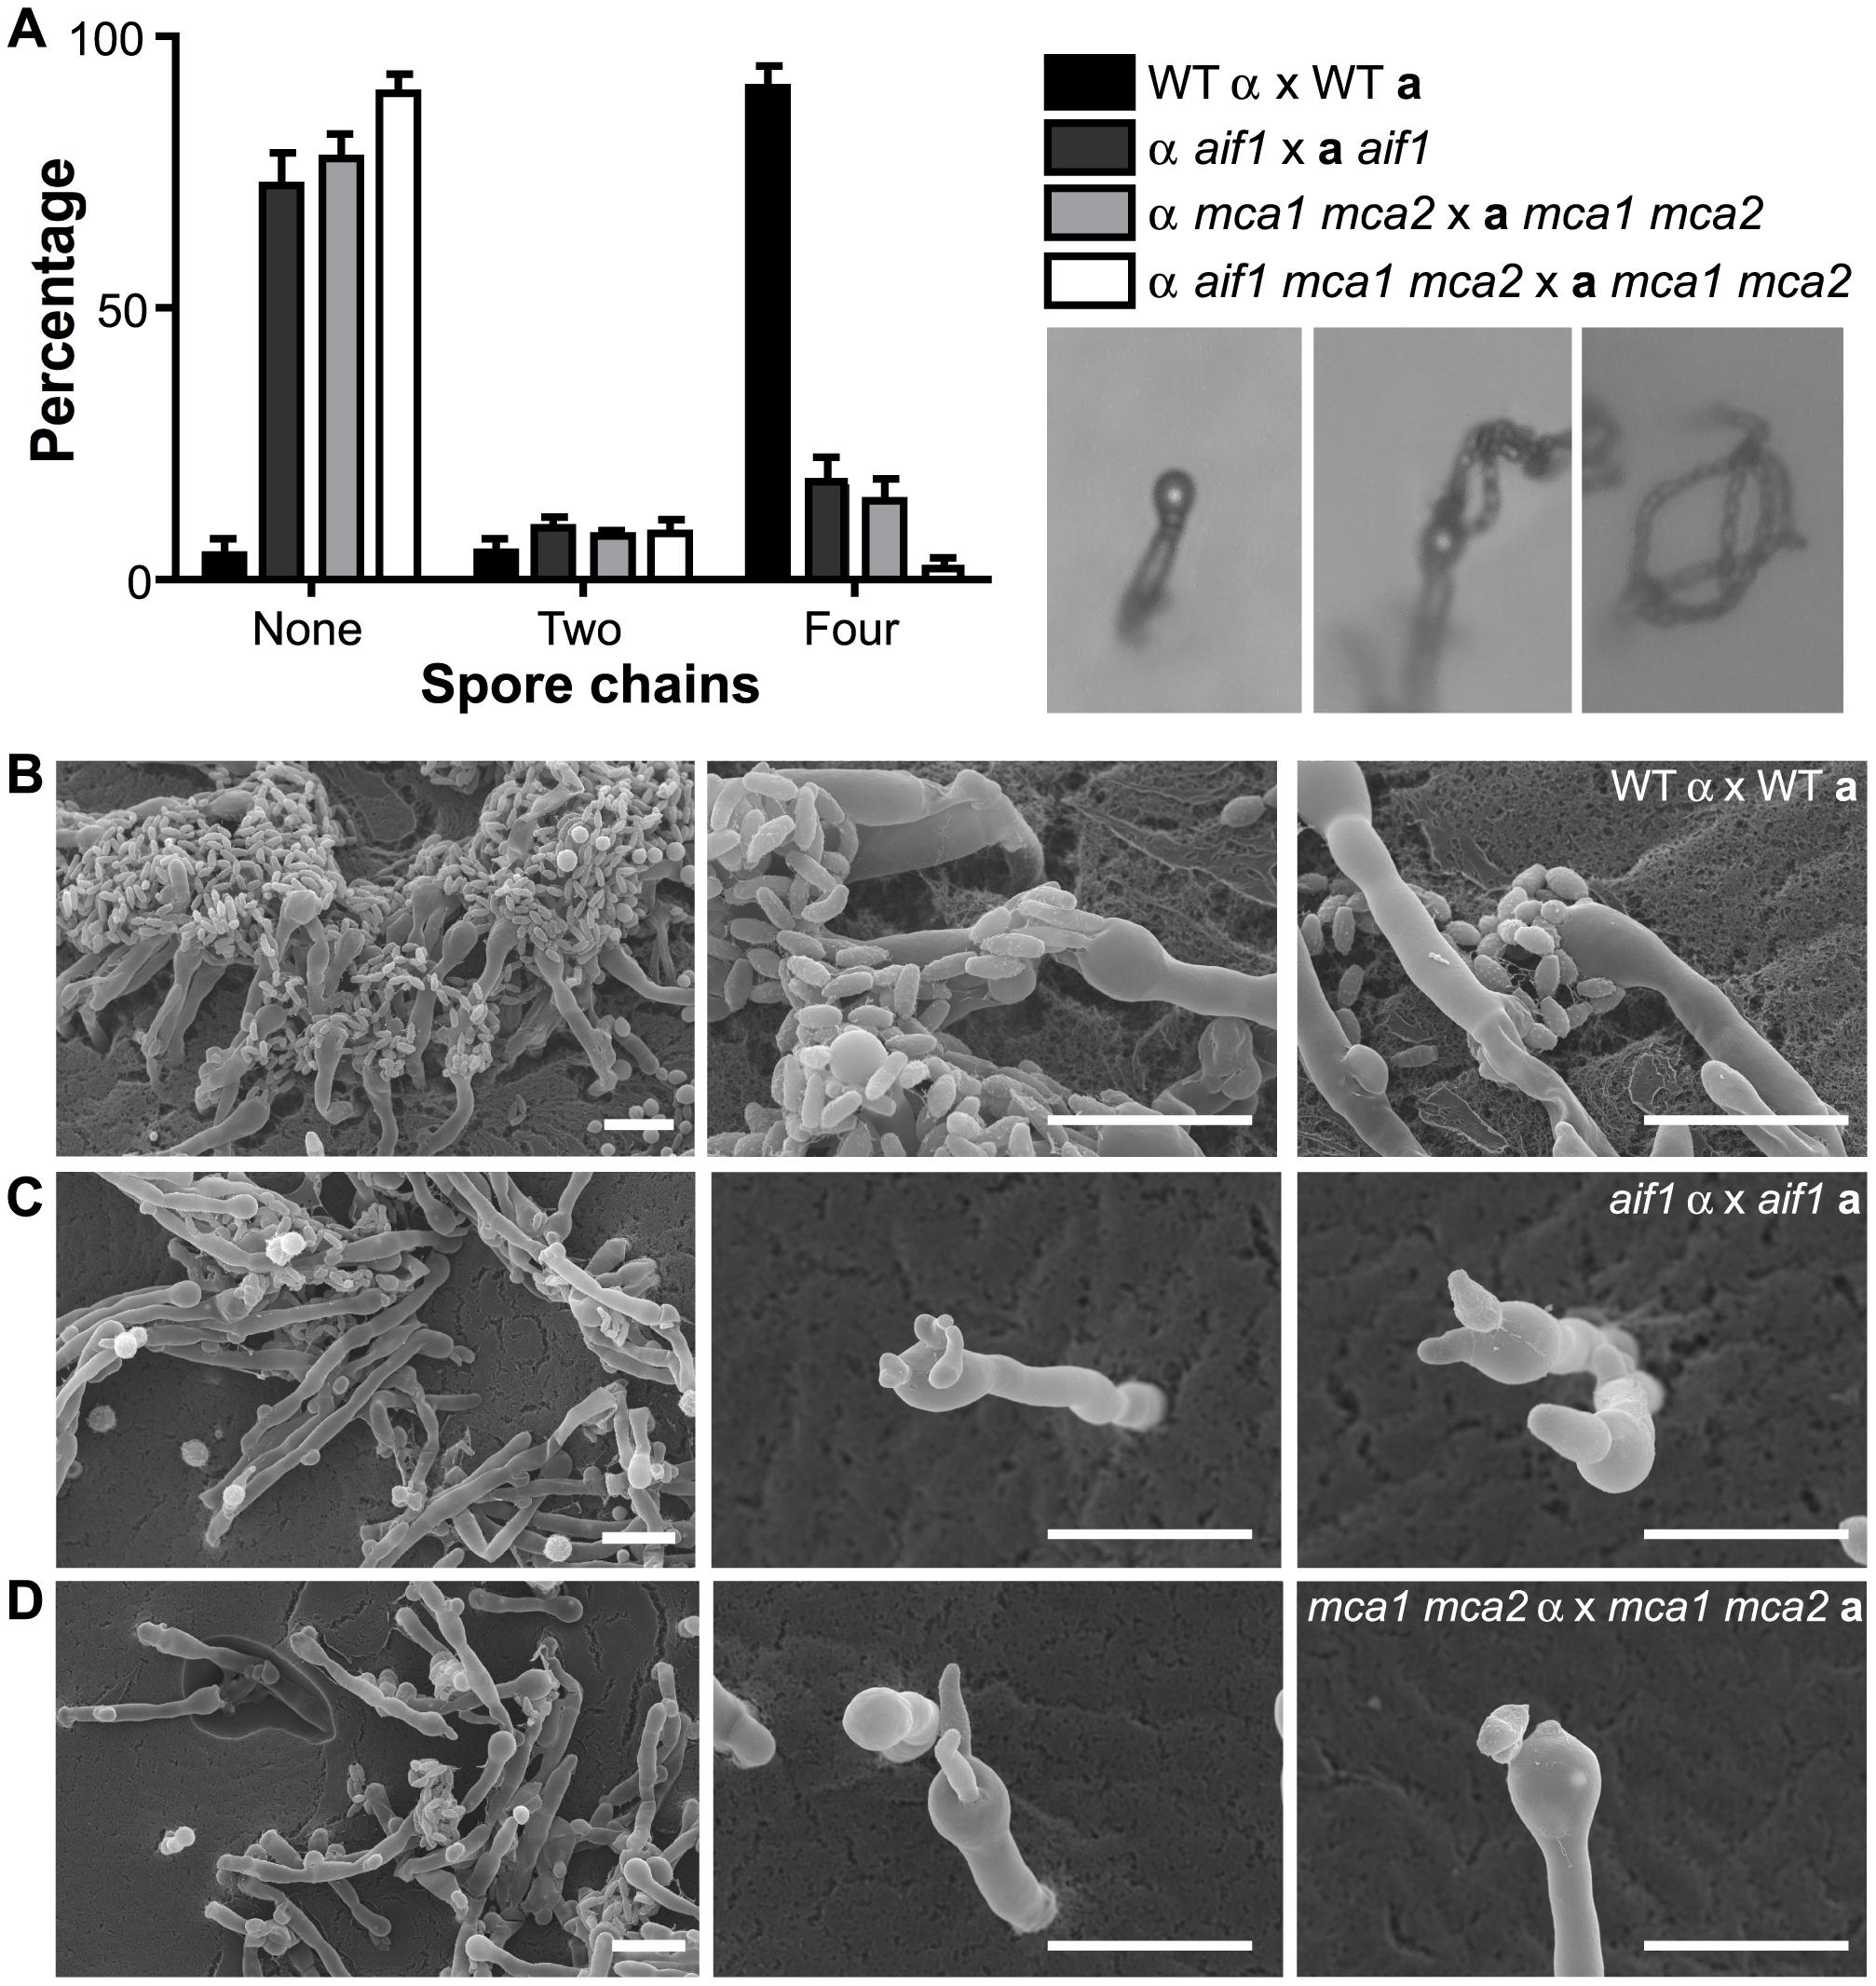 Apoptotic-defective mutants show defective basidiospore formation. A